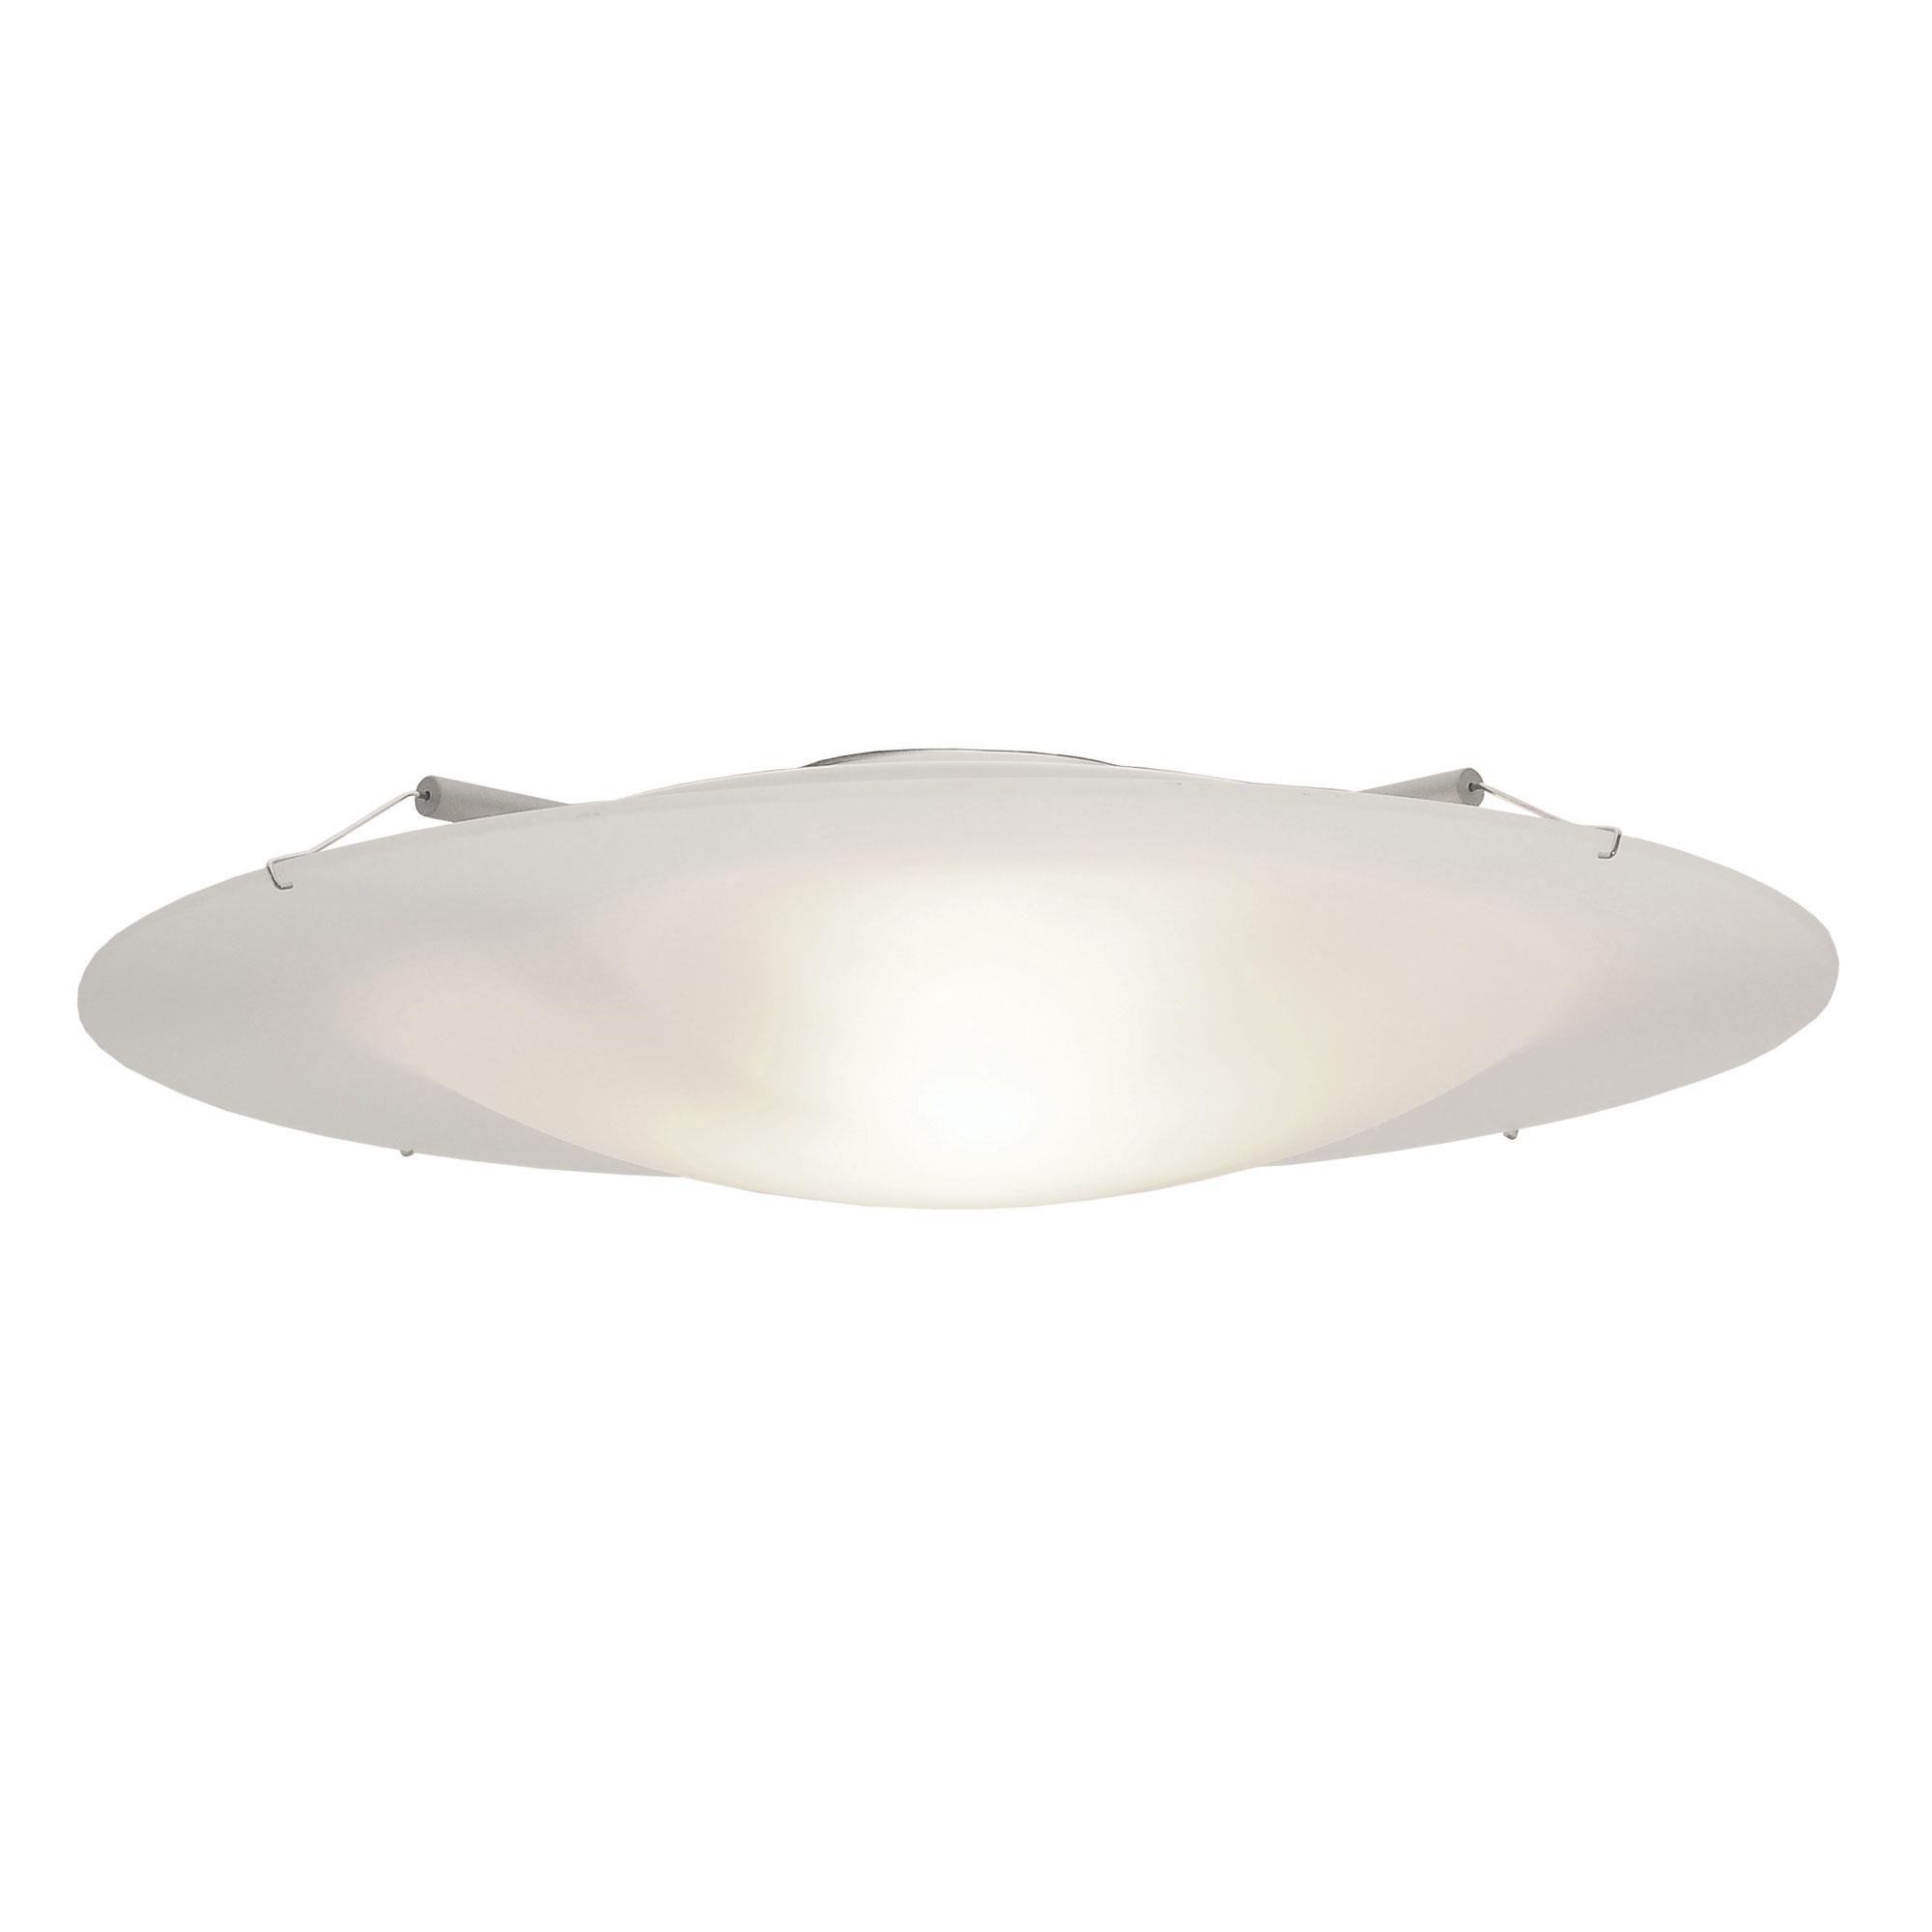 Vanilla Sky Round Fluorescent Ceiling Light by PureEdge Lighting ...